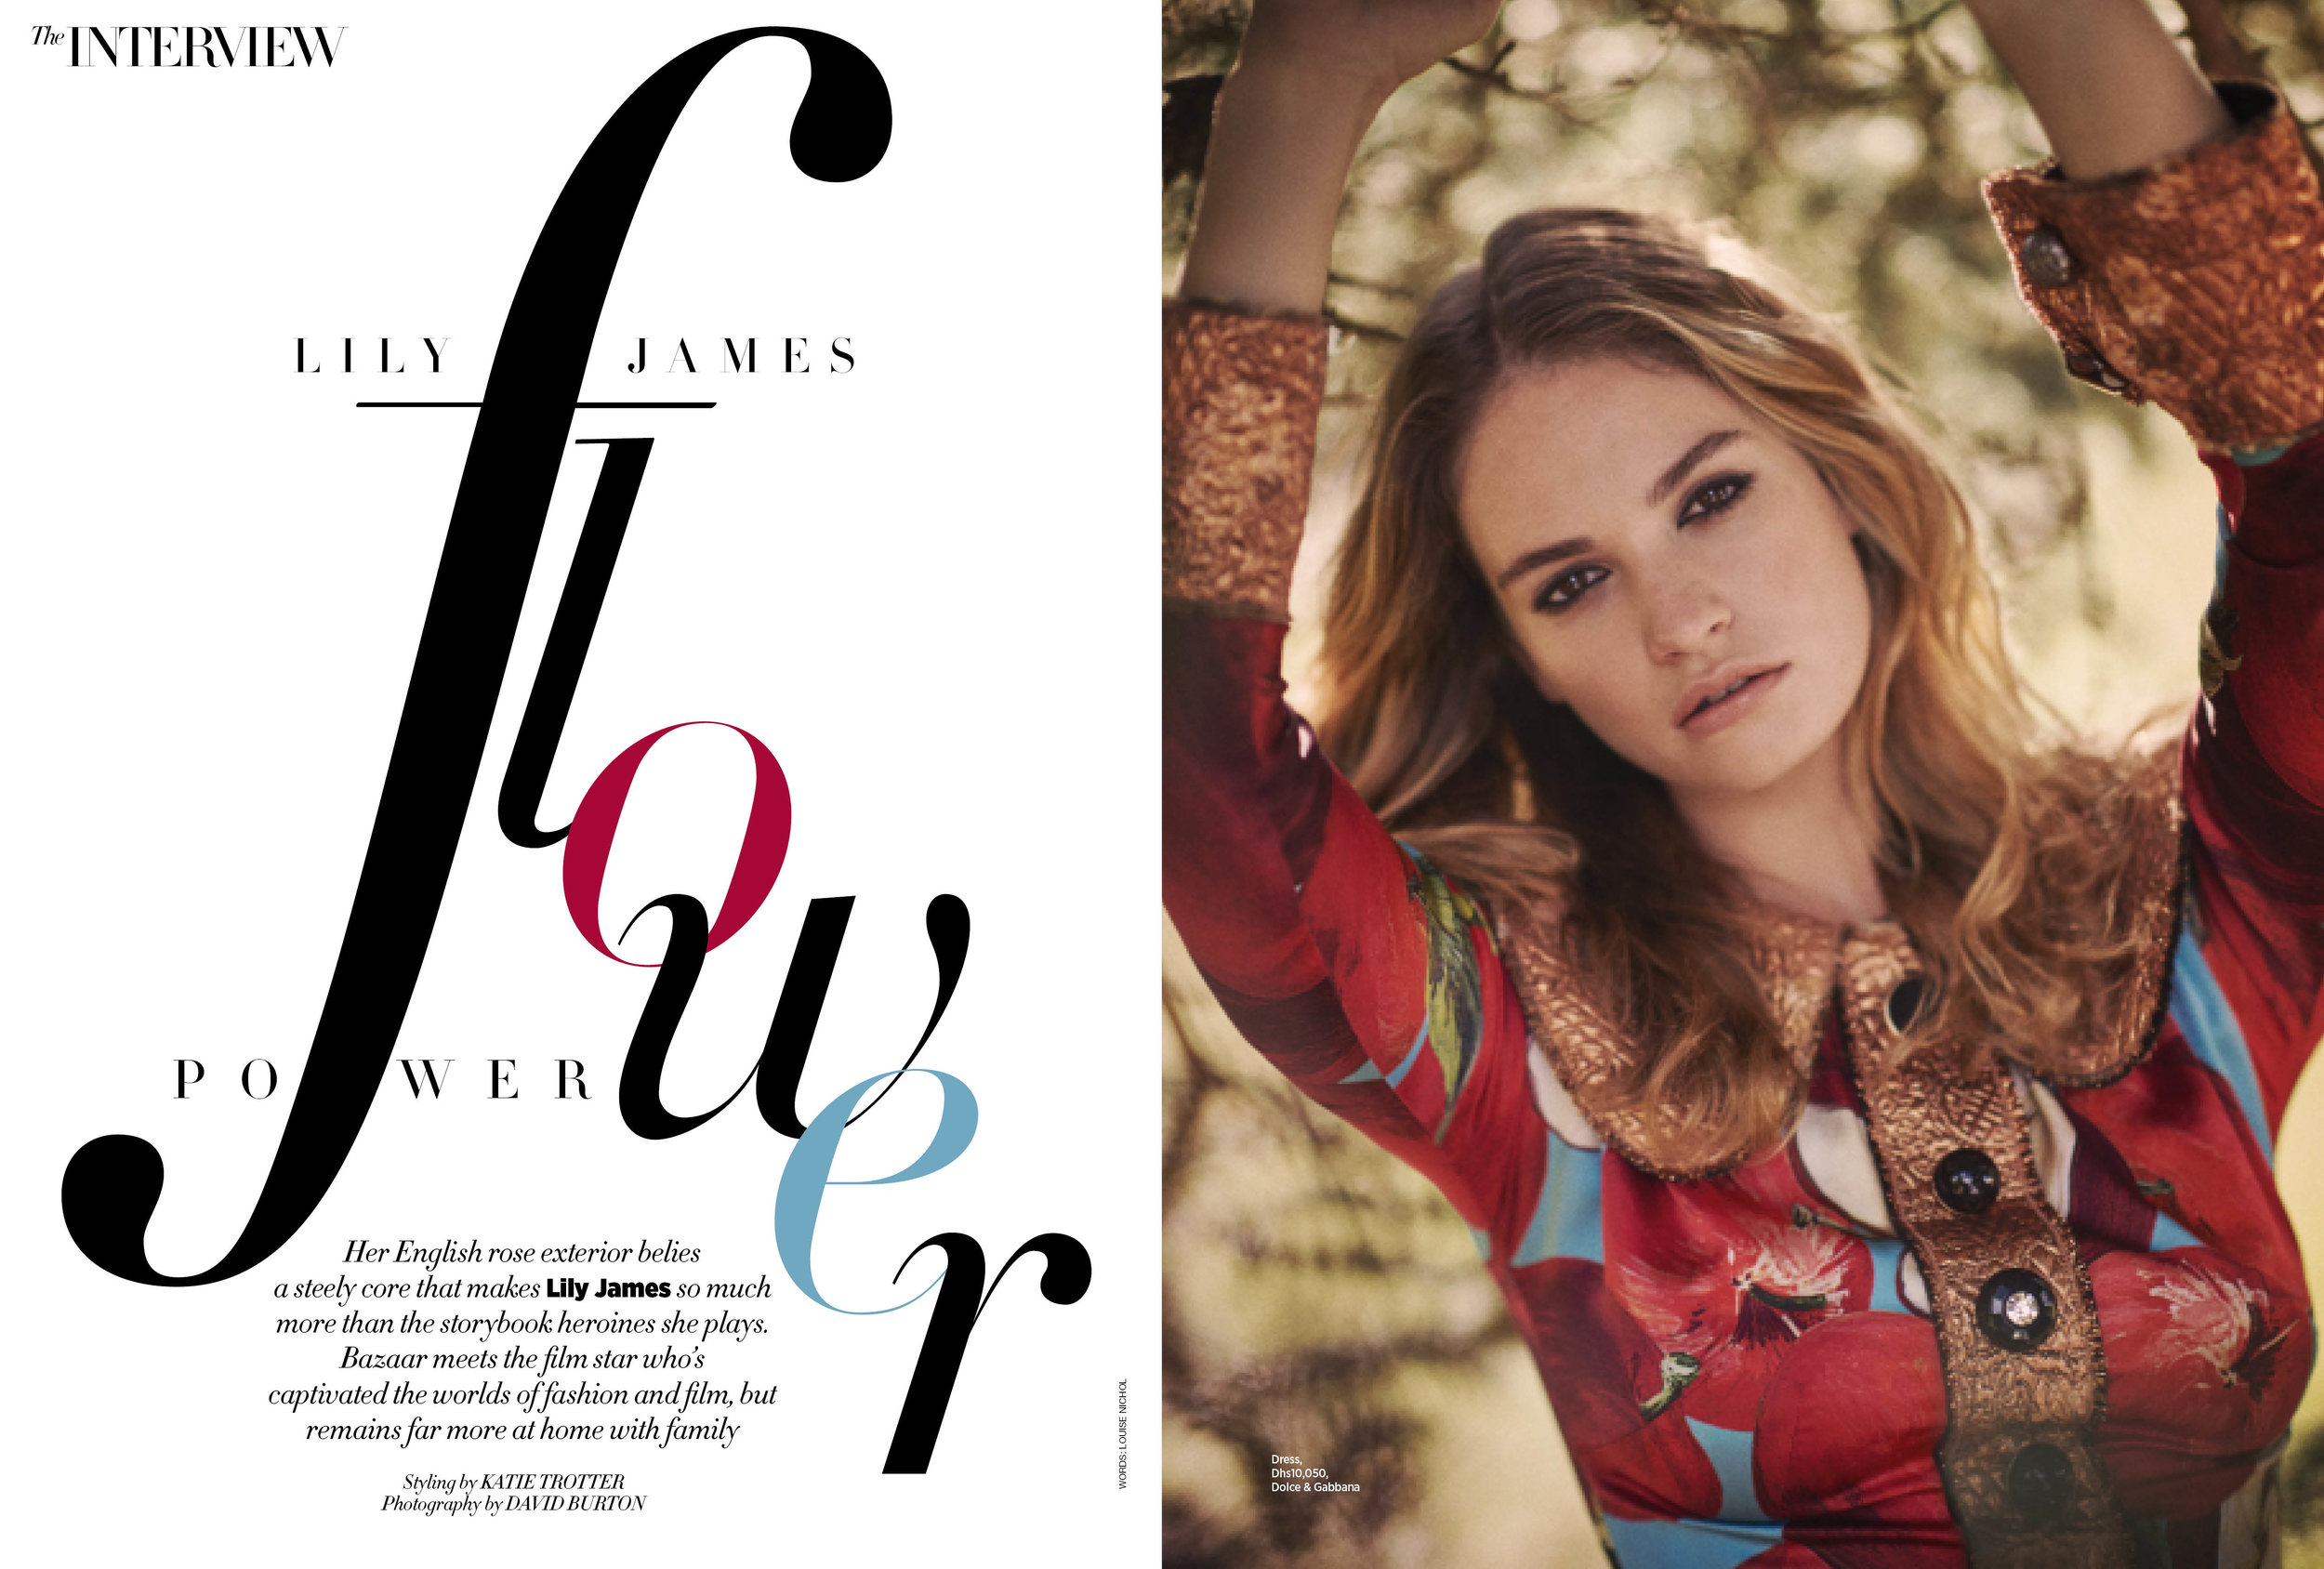 Lily James, December 2016